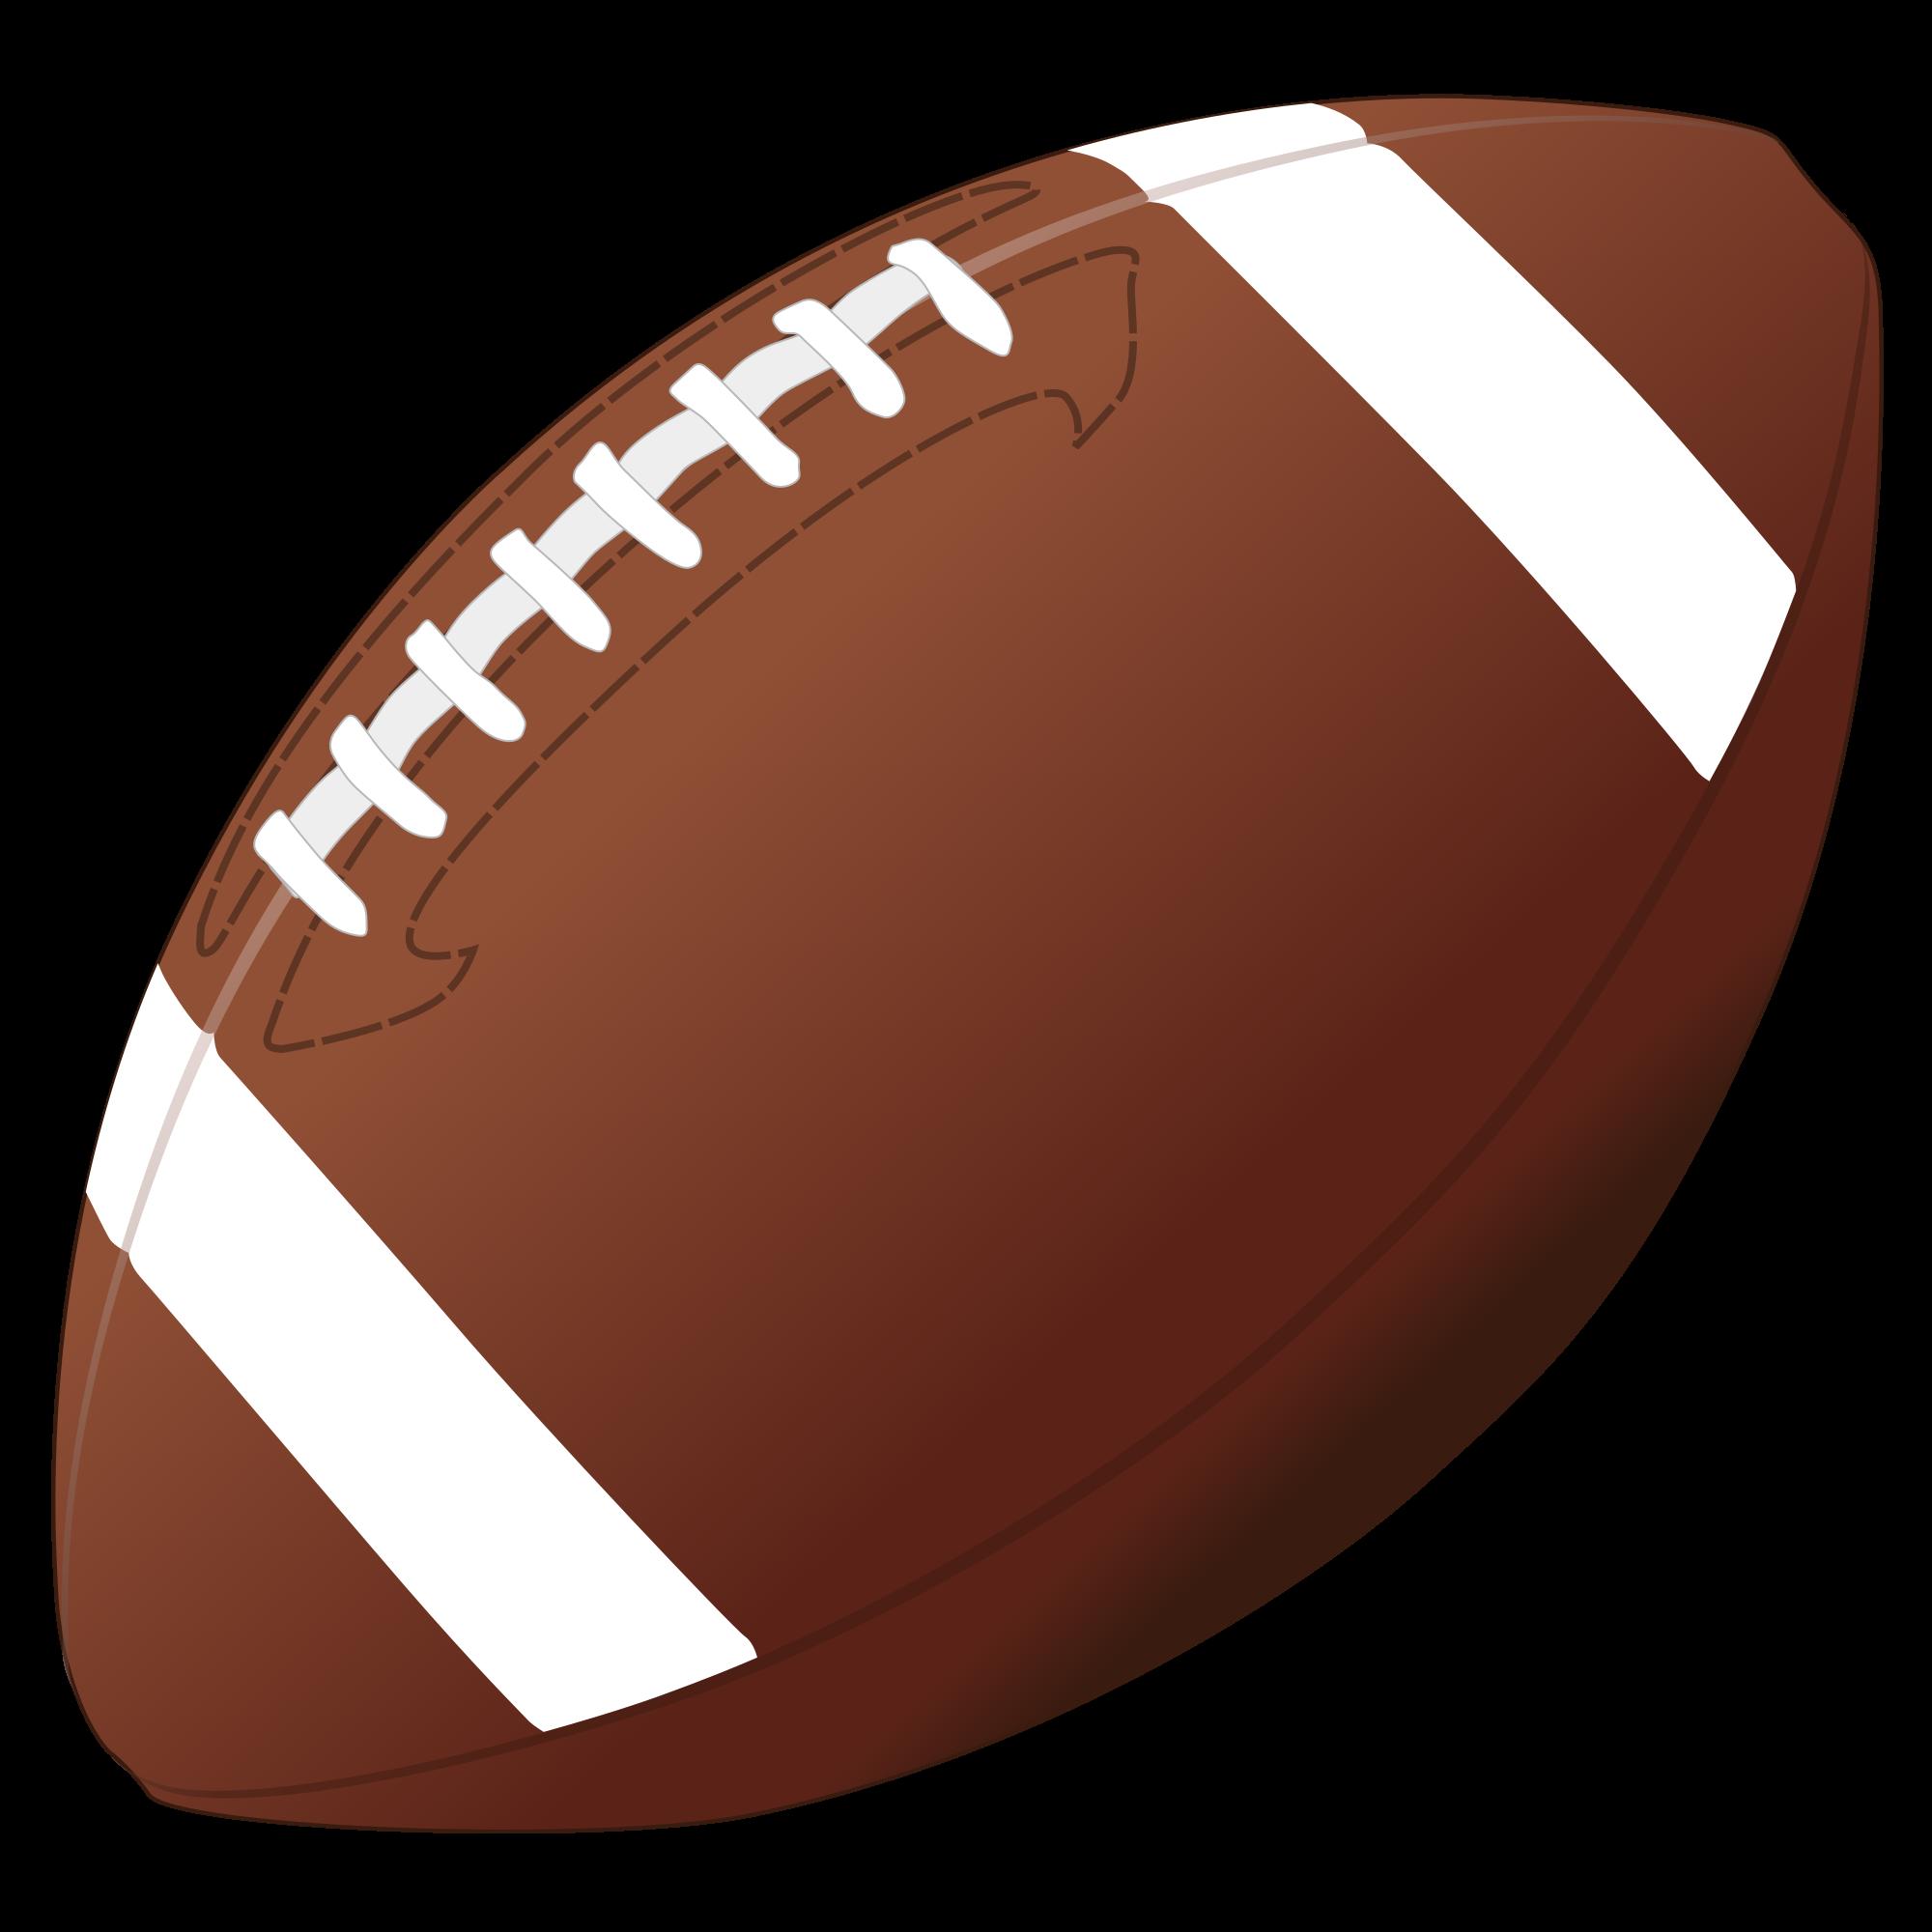 American Football Ball Png Image Football Clip Art Football Football Images